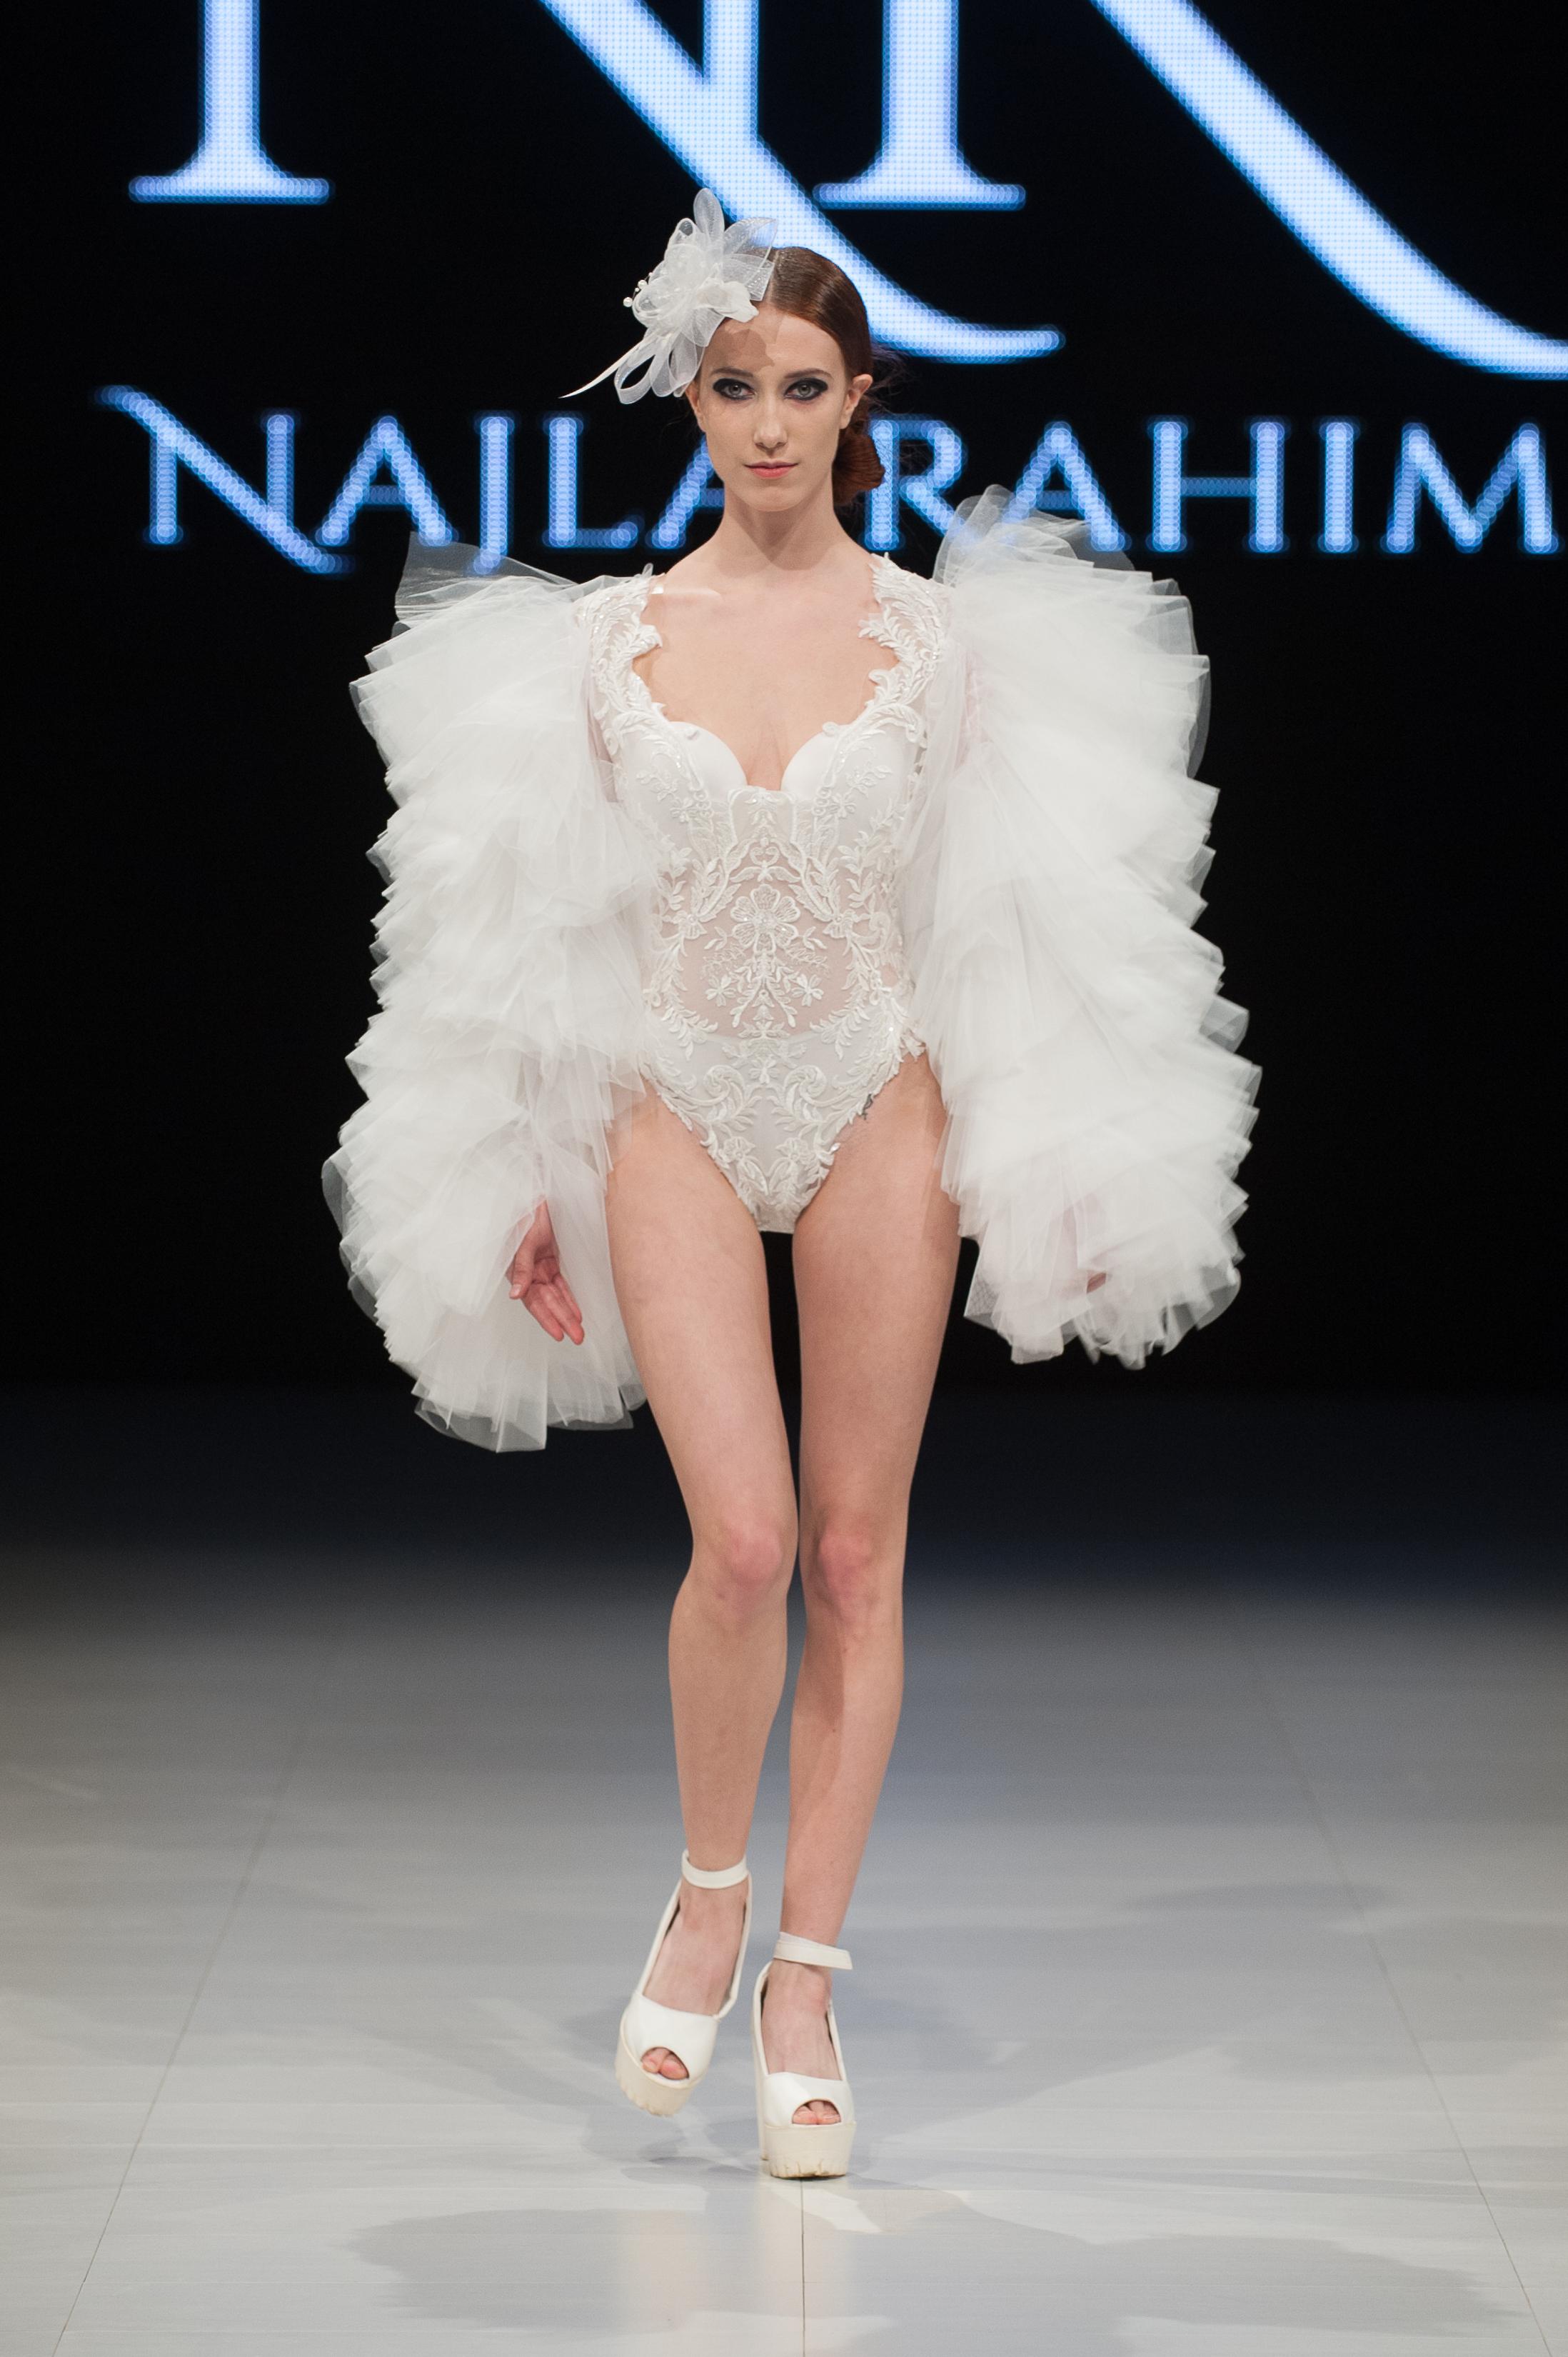 FAT2018-Day1-April17-Najla_Rahimi-Runway-Che_Rosales-LARAWAN-5949.jpg